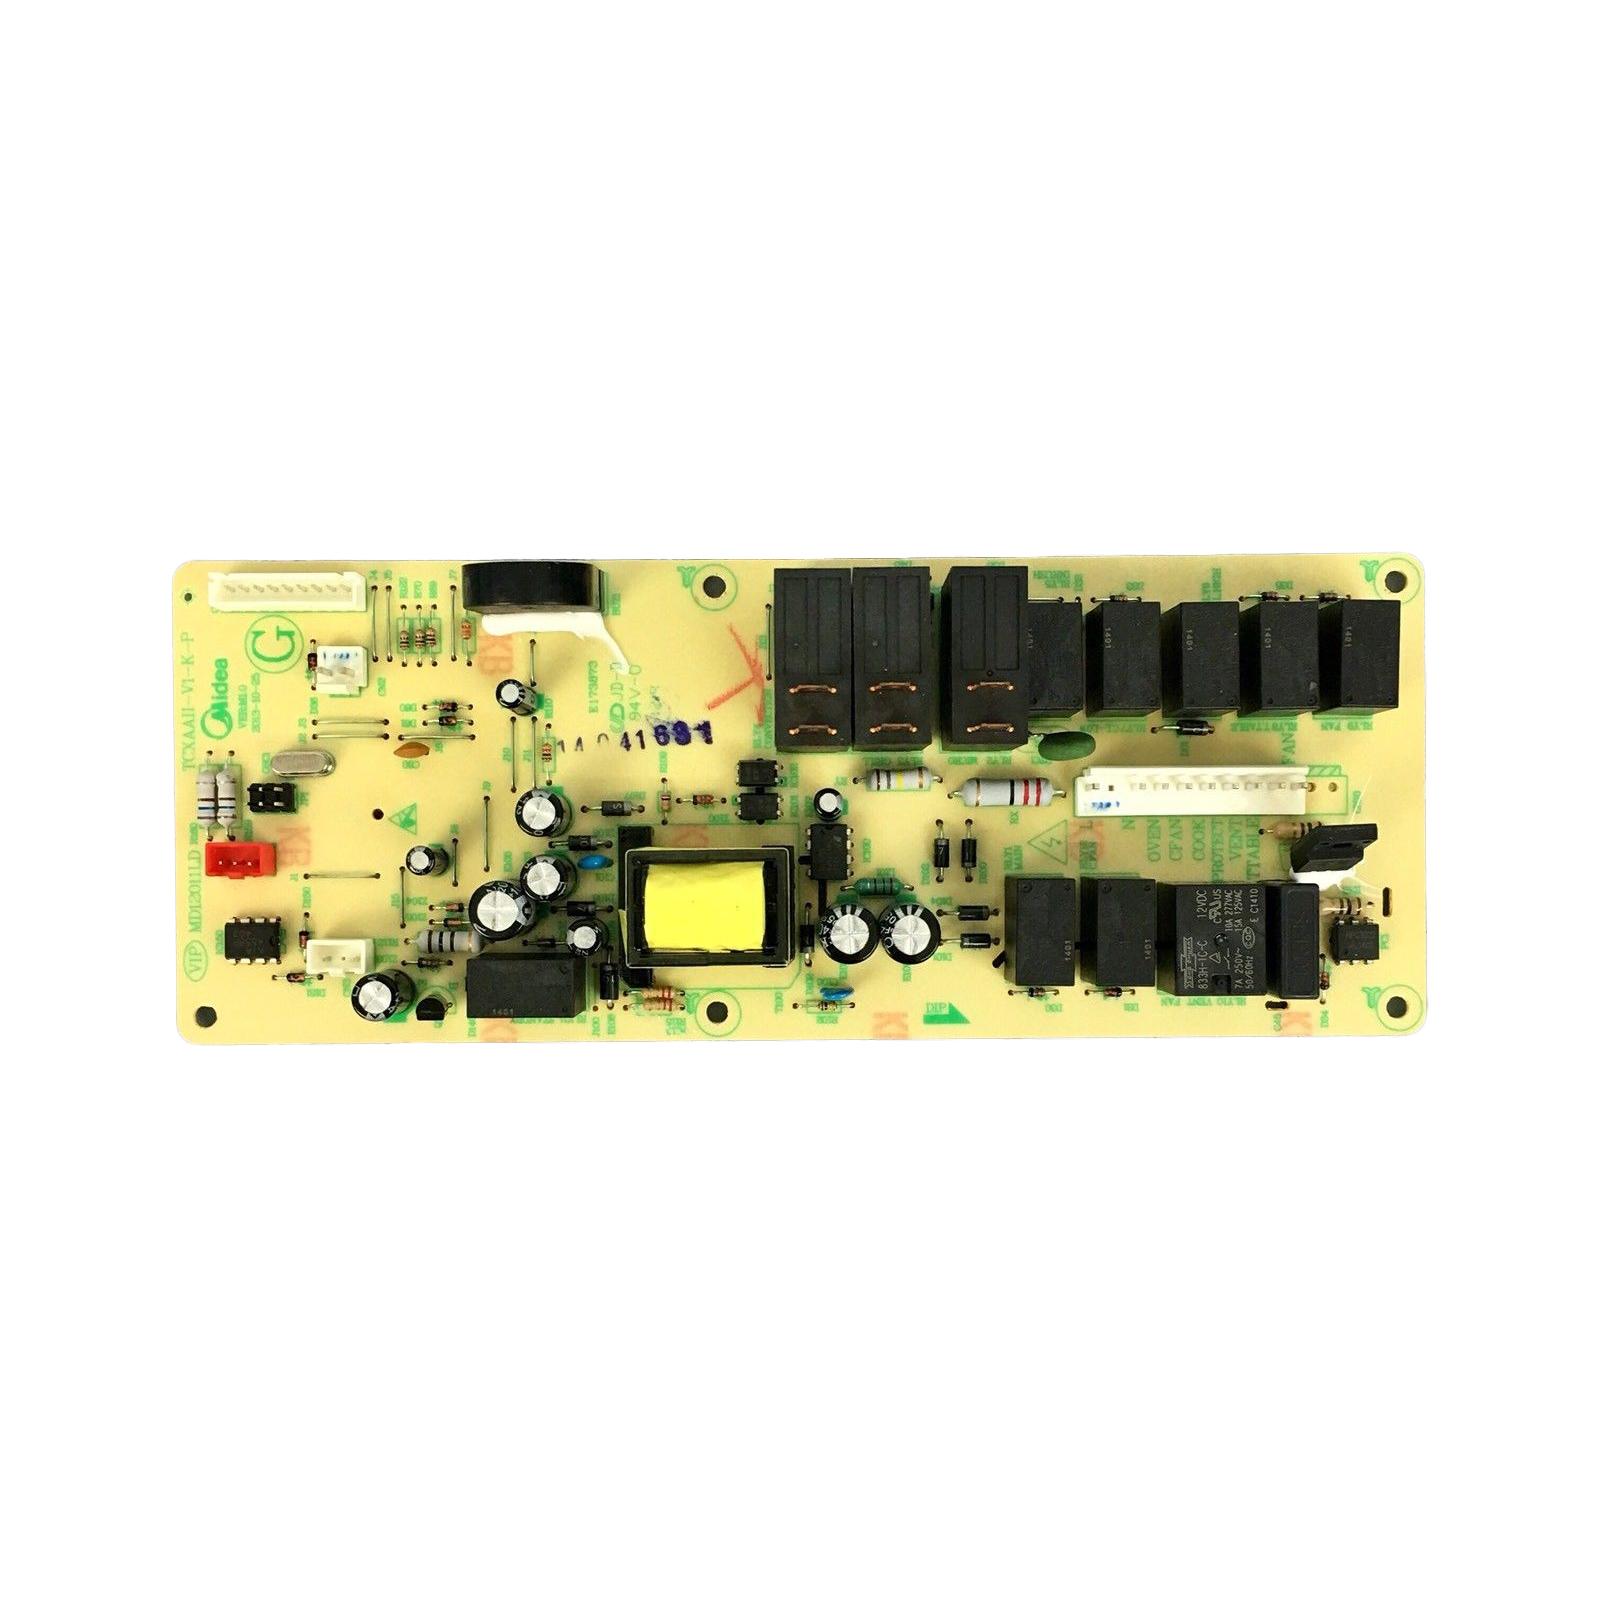 Frigidaire Fra125ct113 Electronic Control Board Genuine Oem